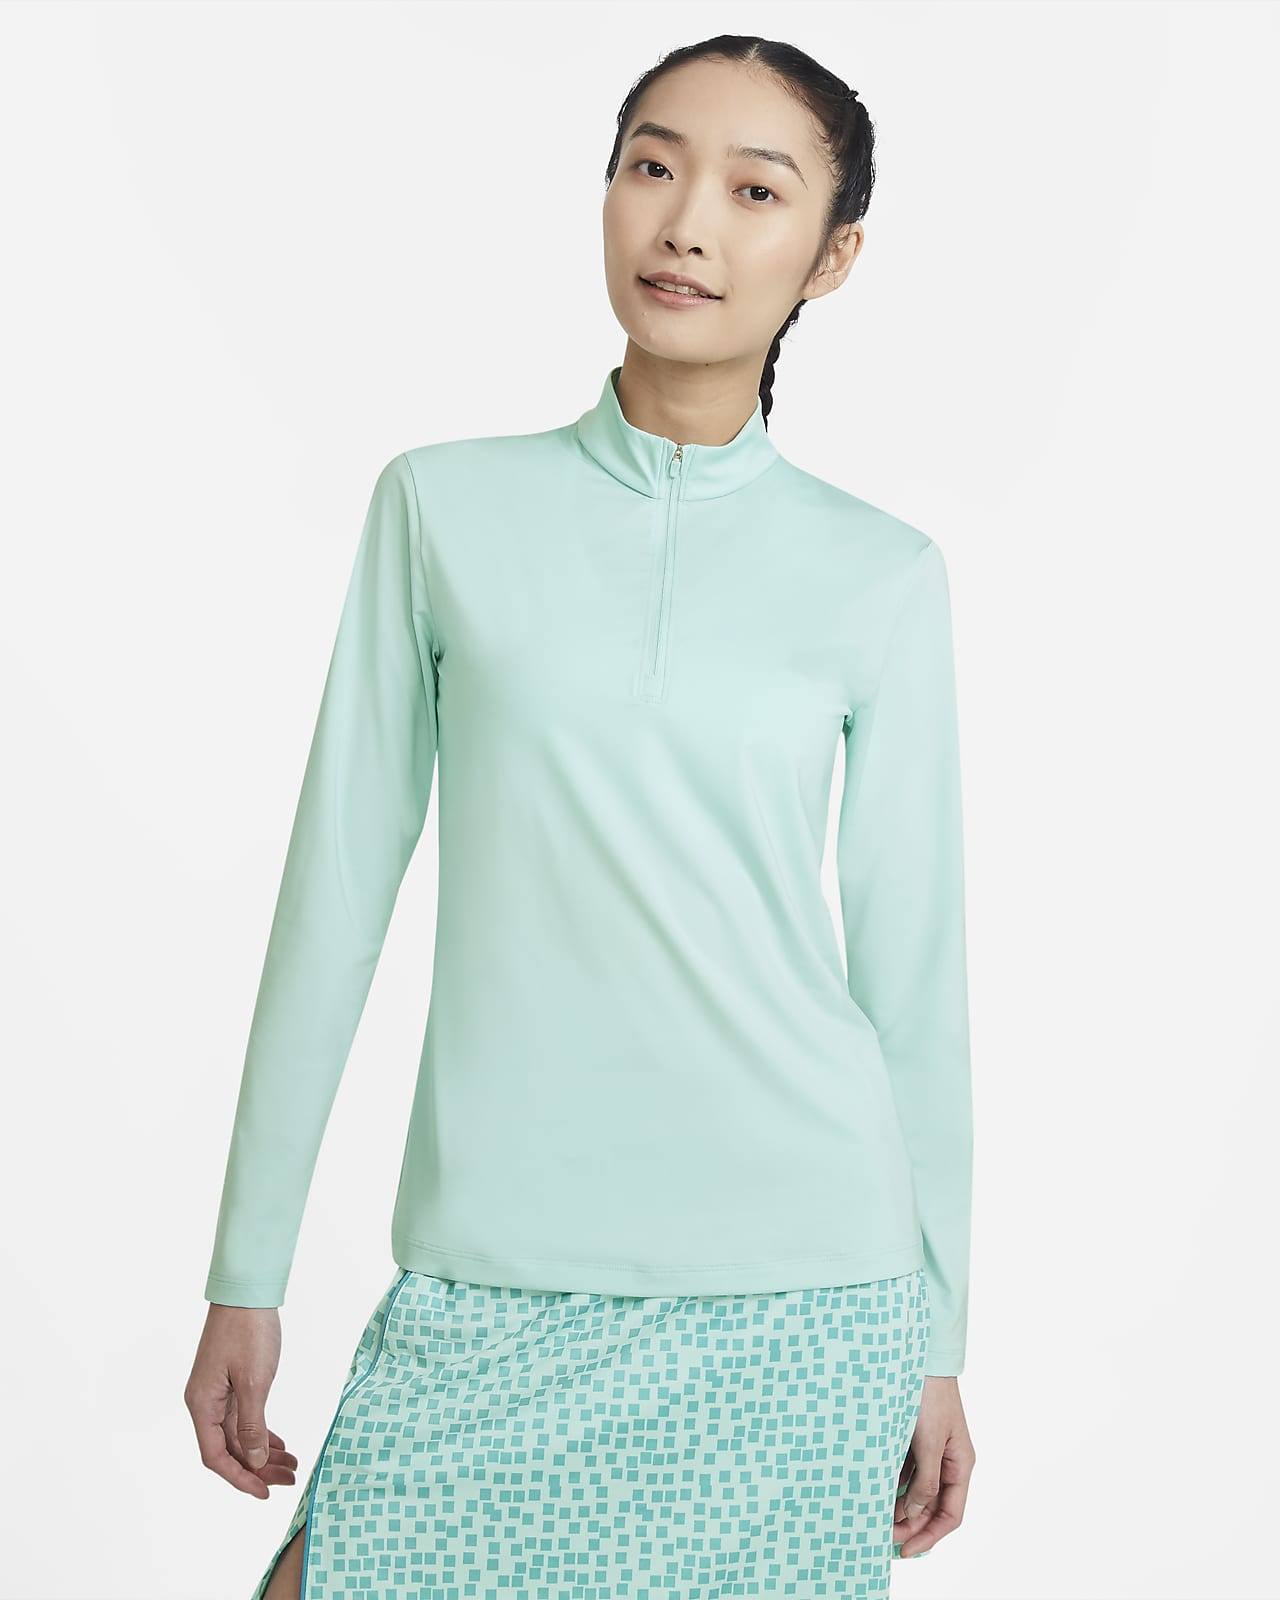 Prenda para la parte superior de golf de manga larga para mujer Nike Dri-FIT UV Victory